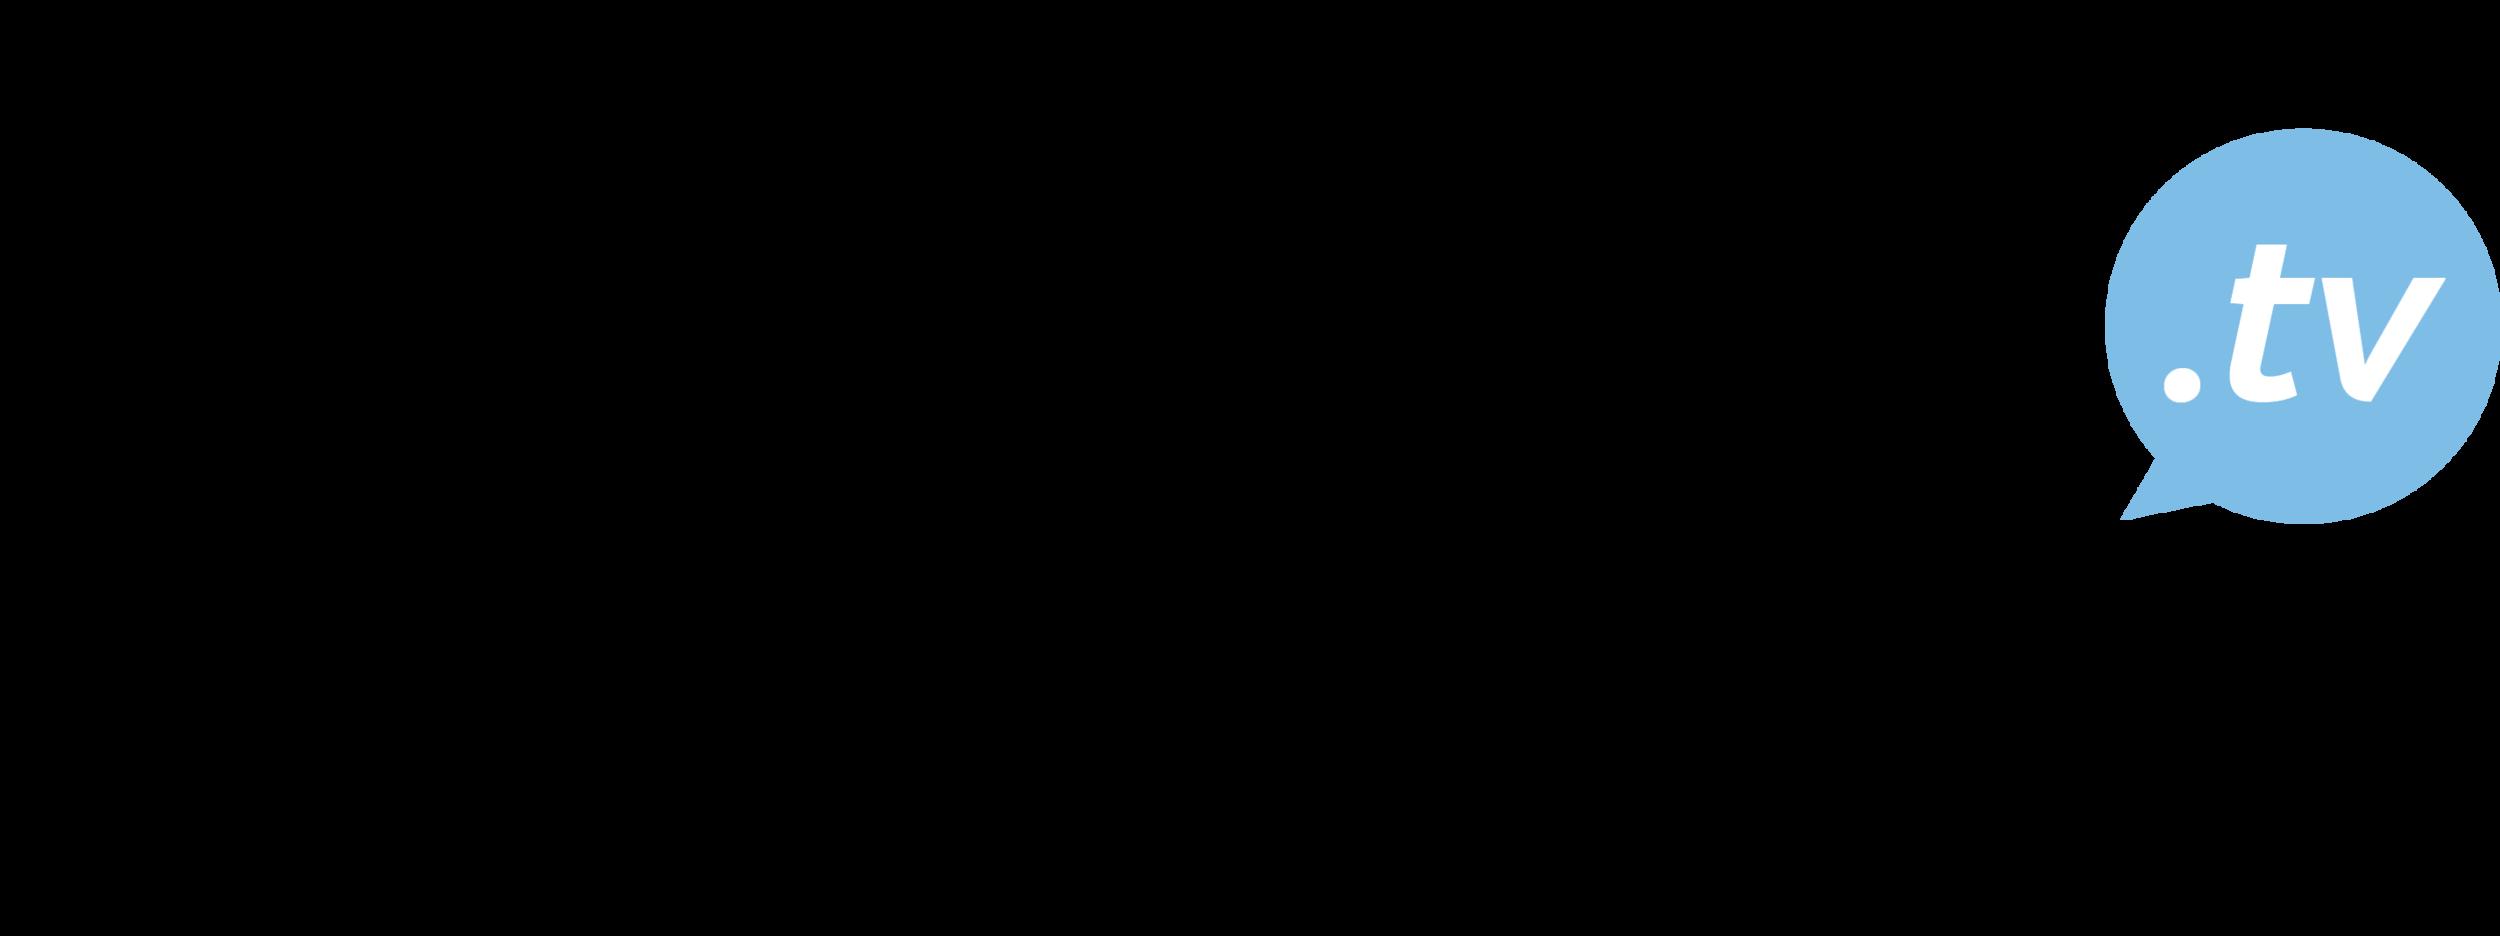 logo_teads-tv_noir_2853px.png